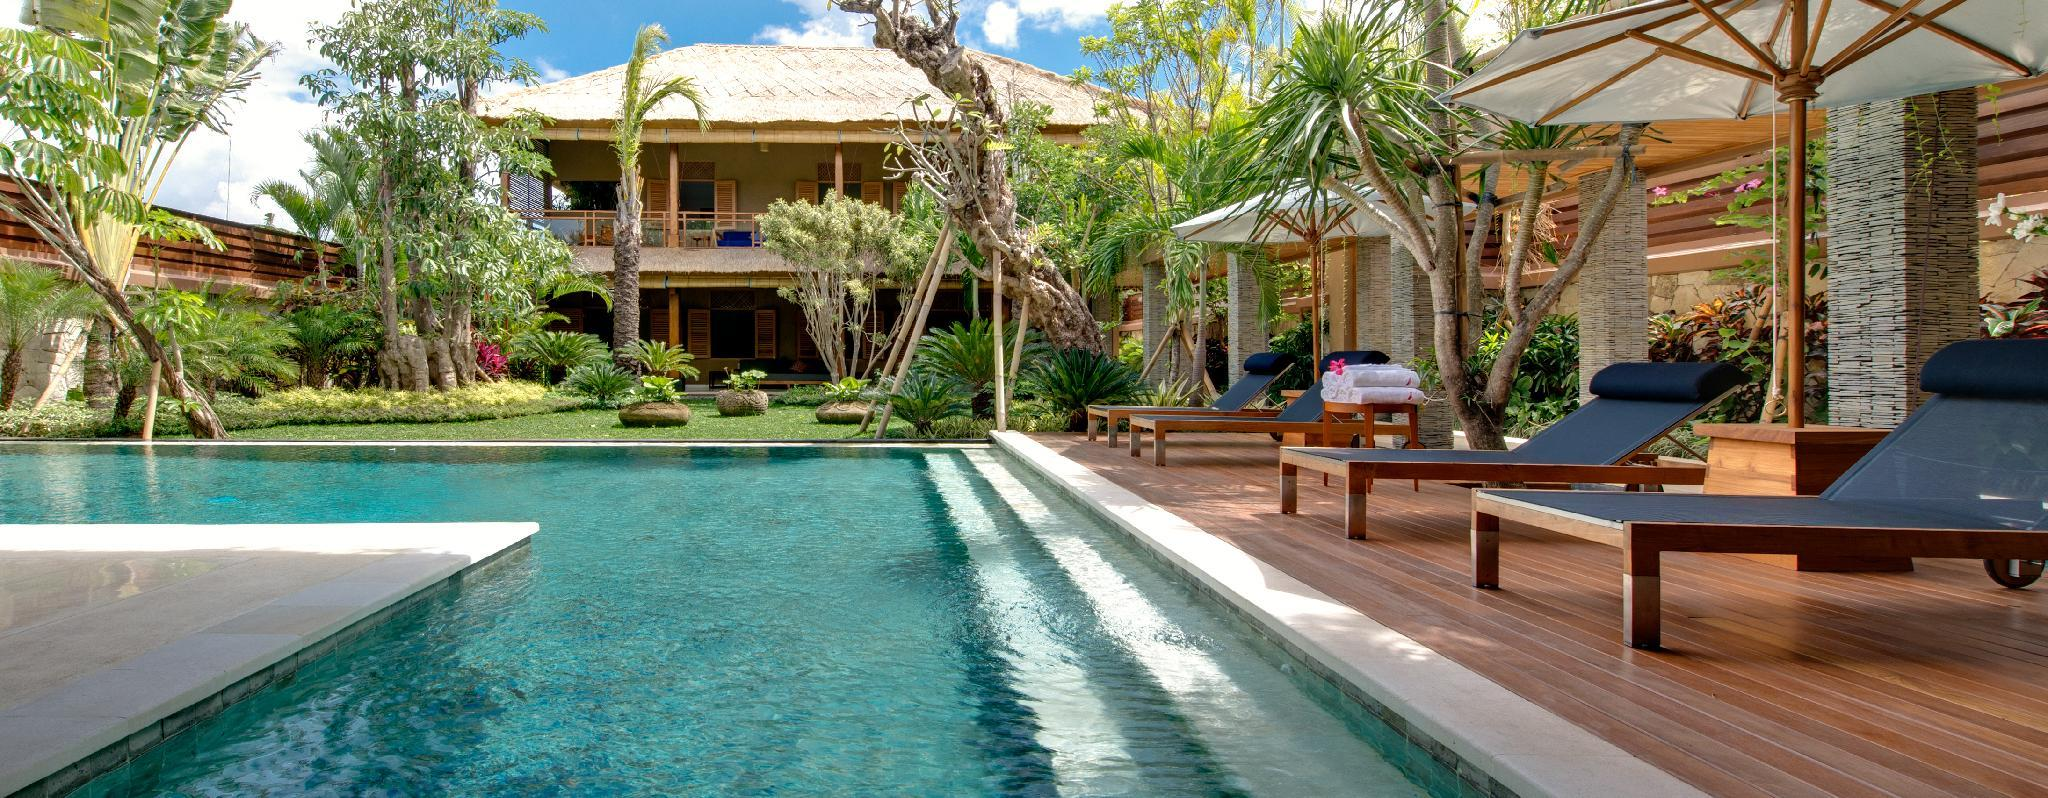 Family retreat 10 BR villa by the beach